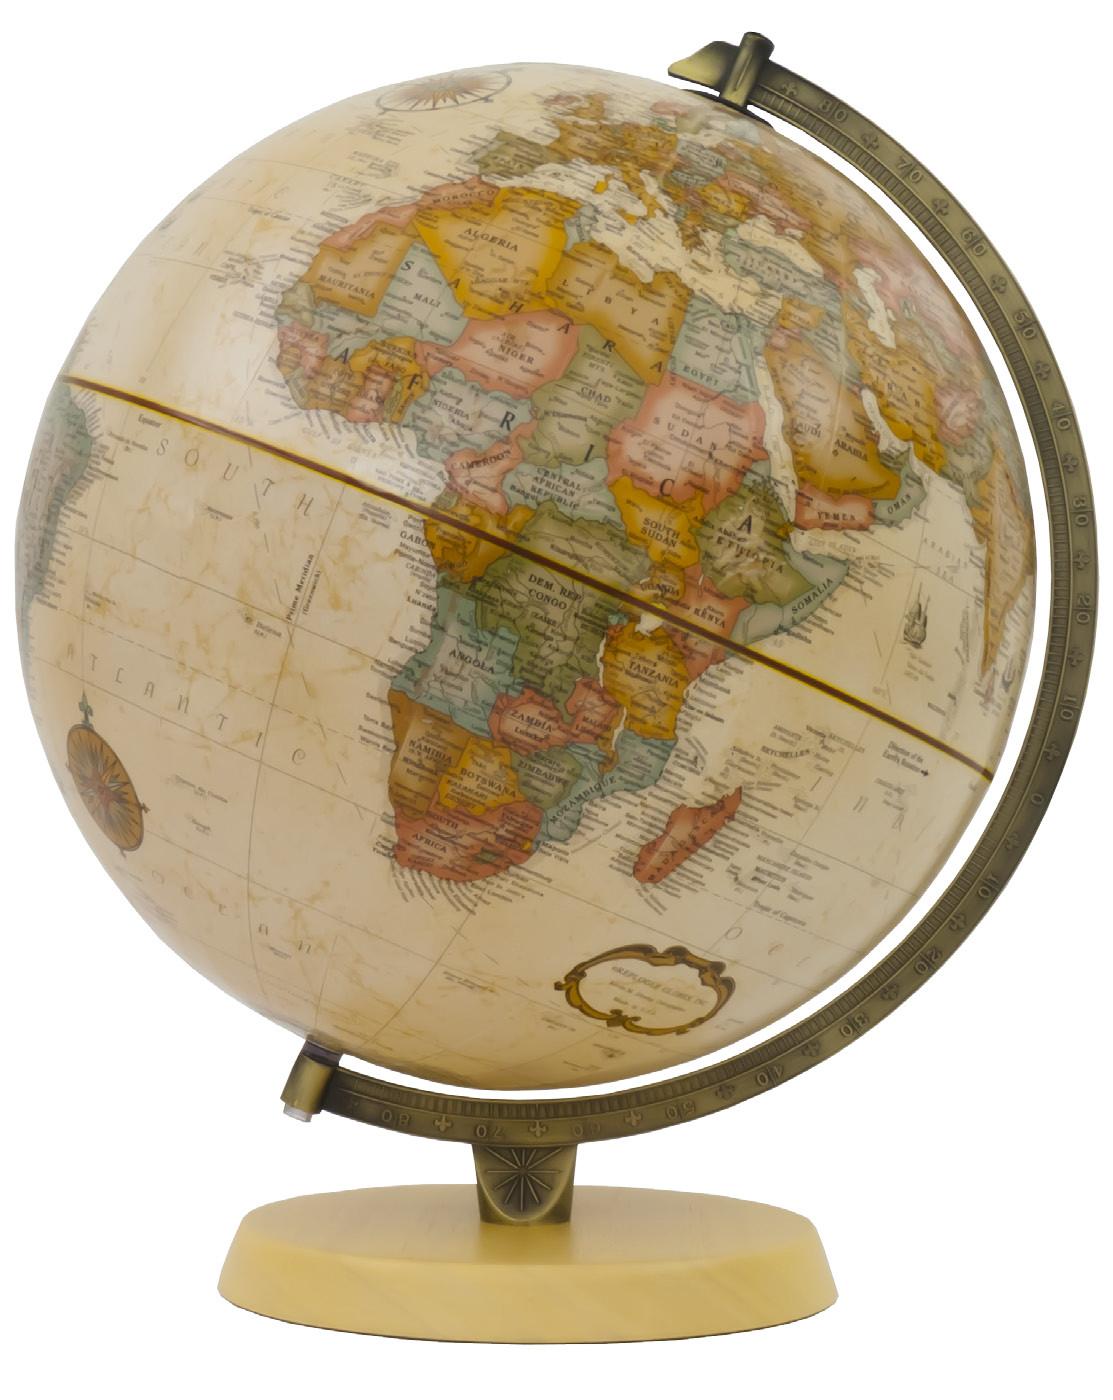 Chelmsford Antique Globe